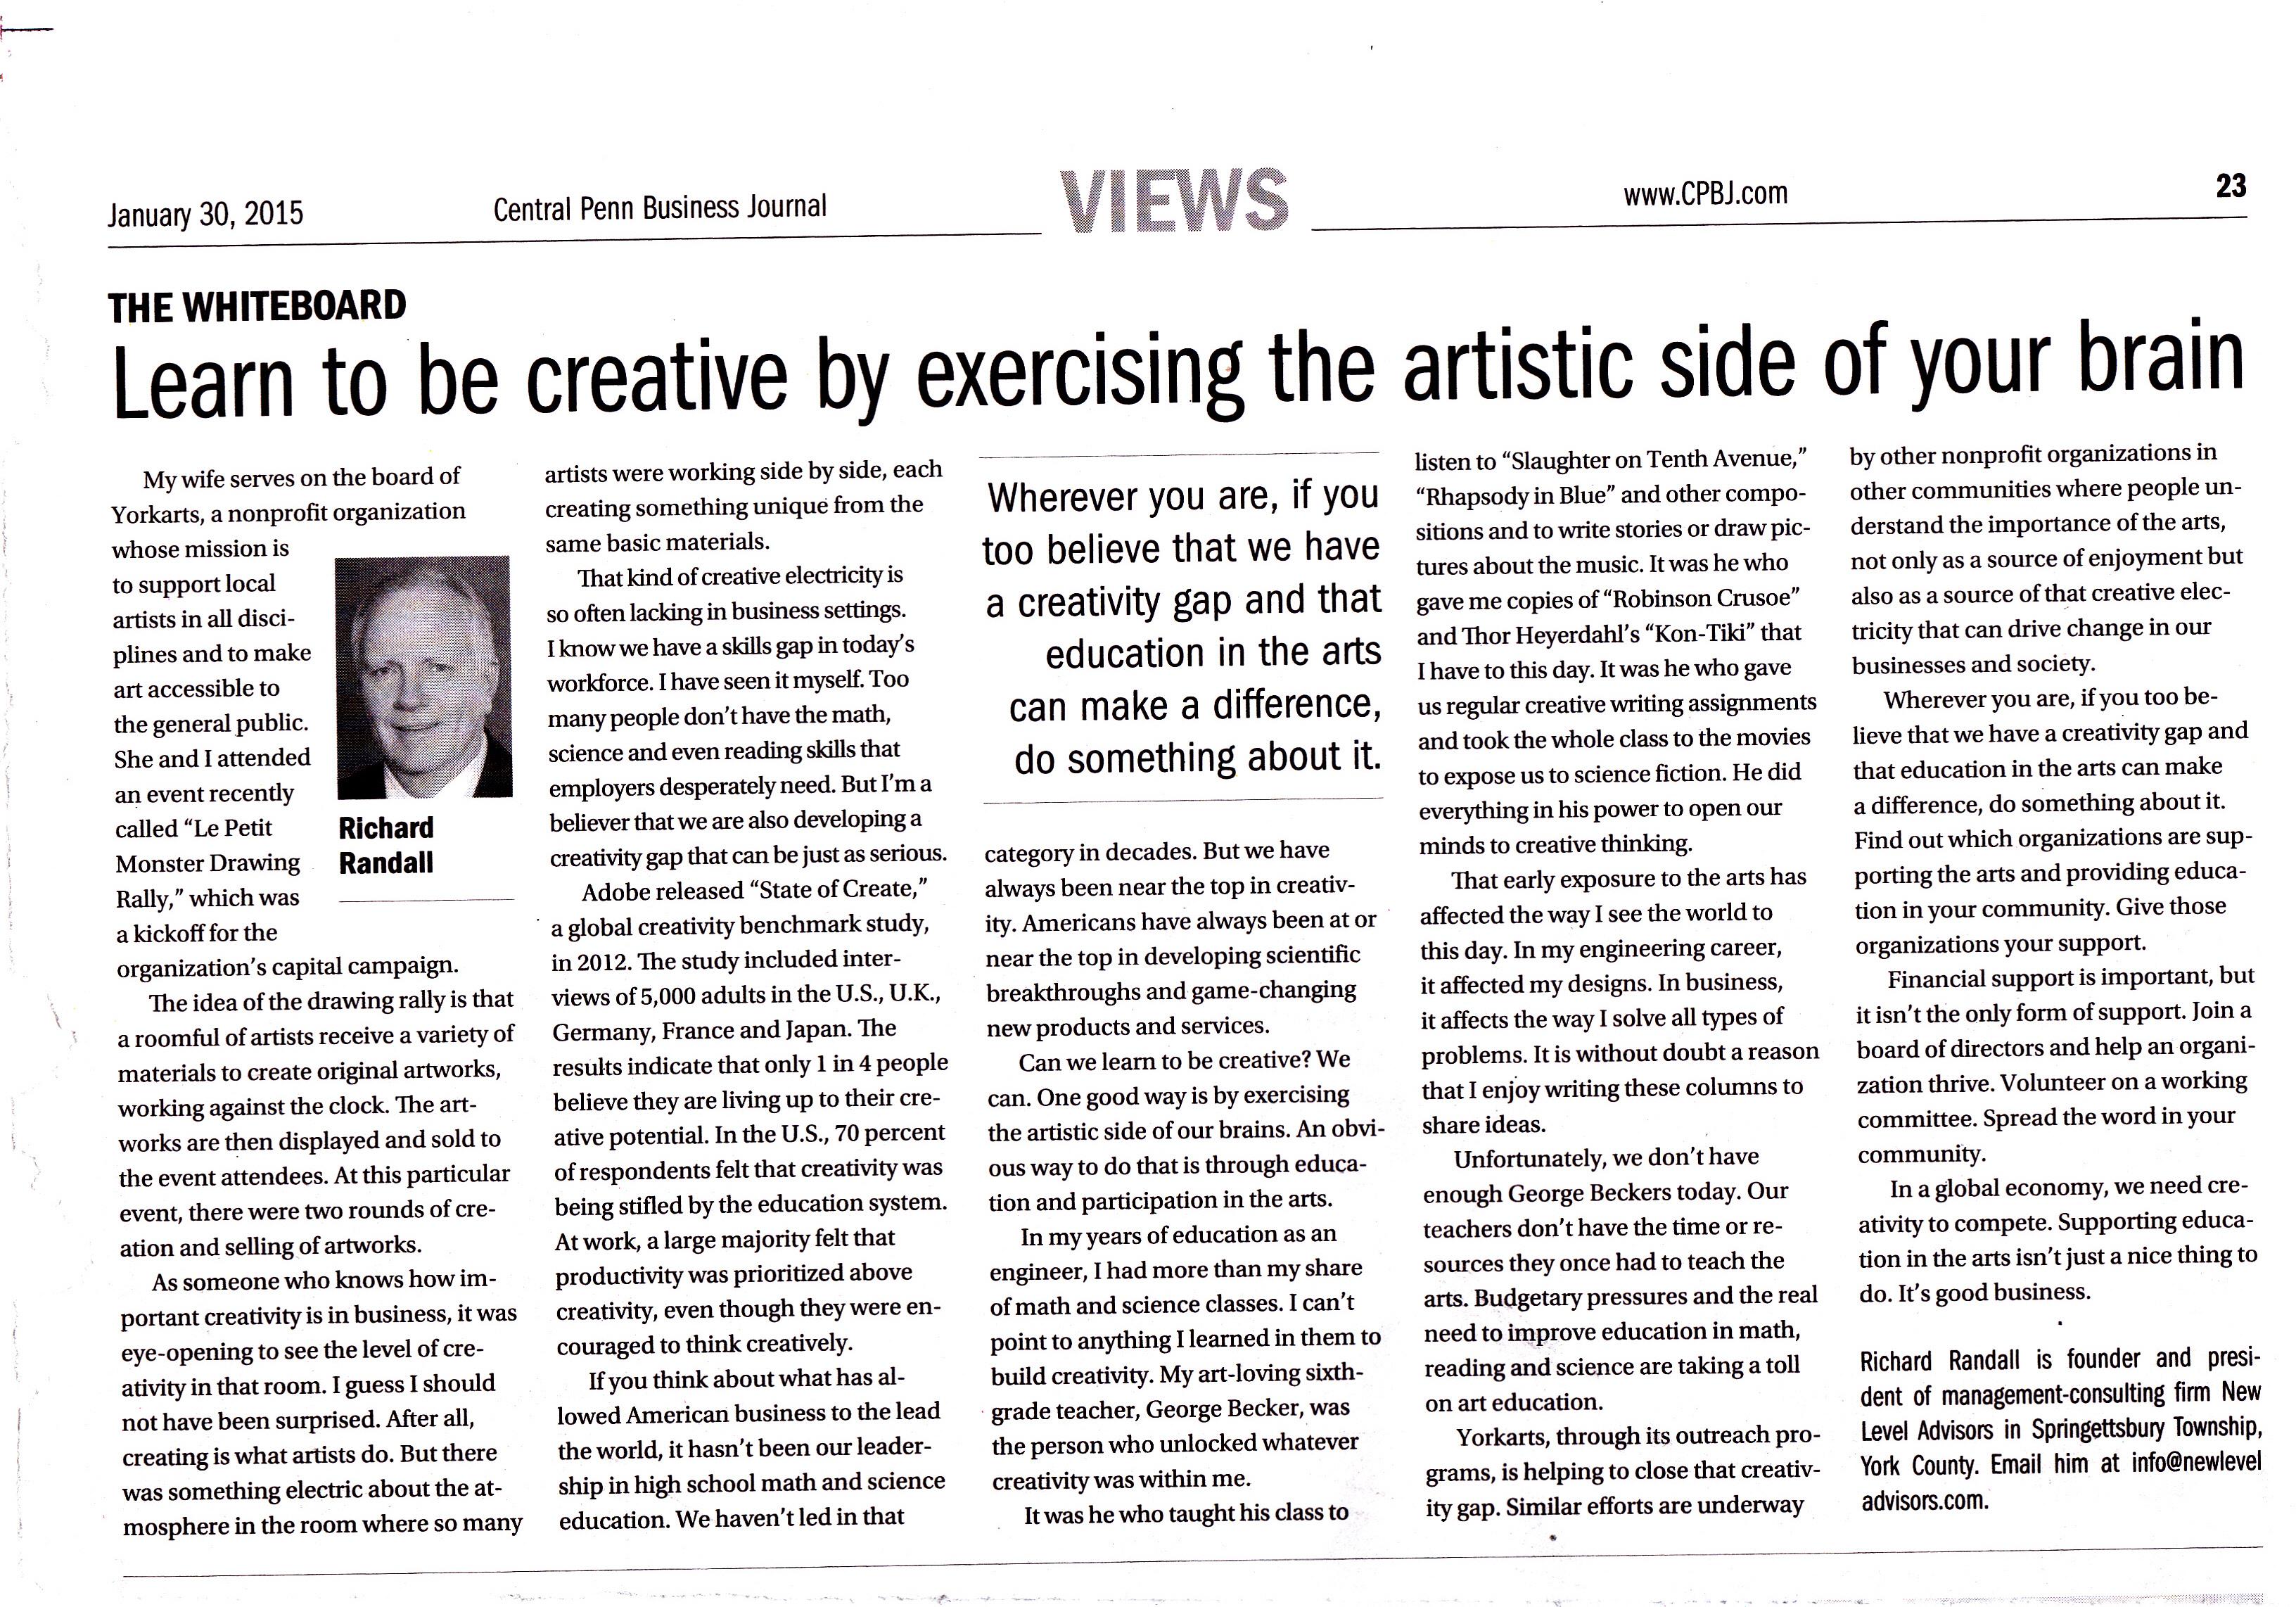 CPBJ article